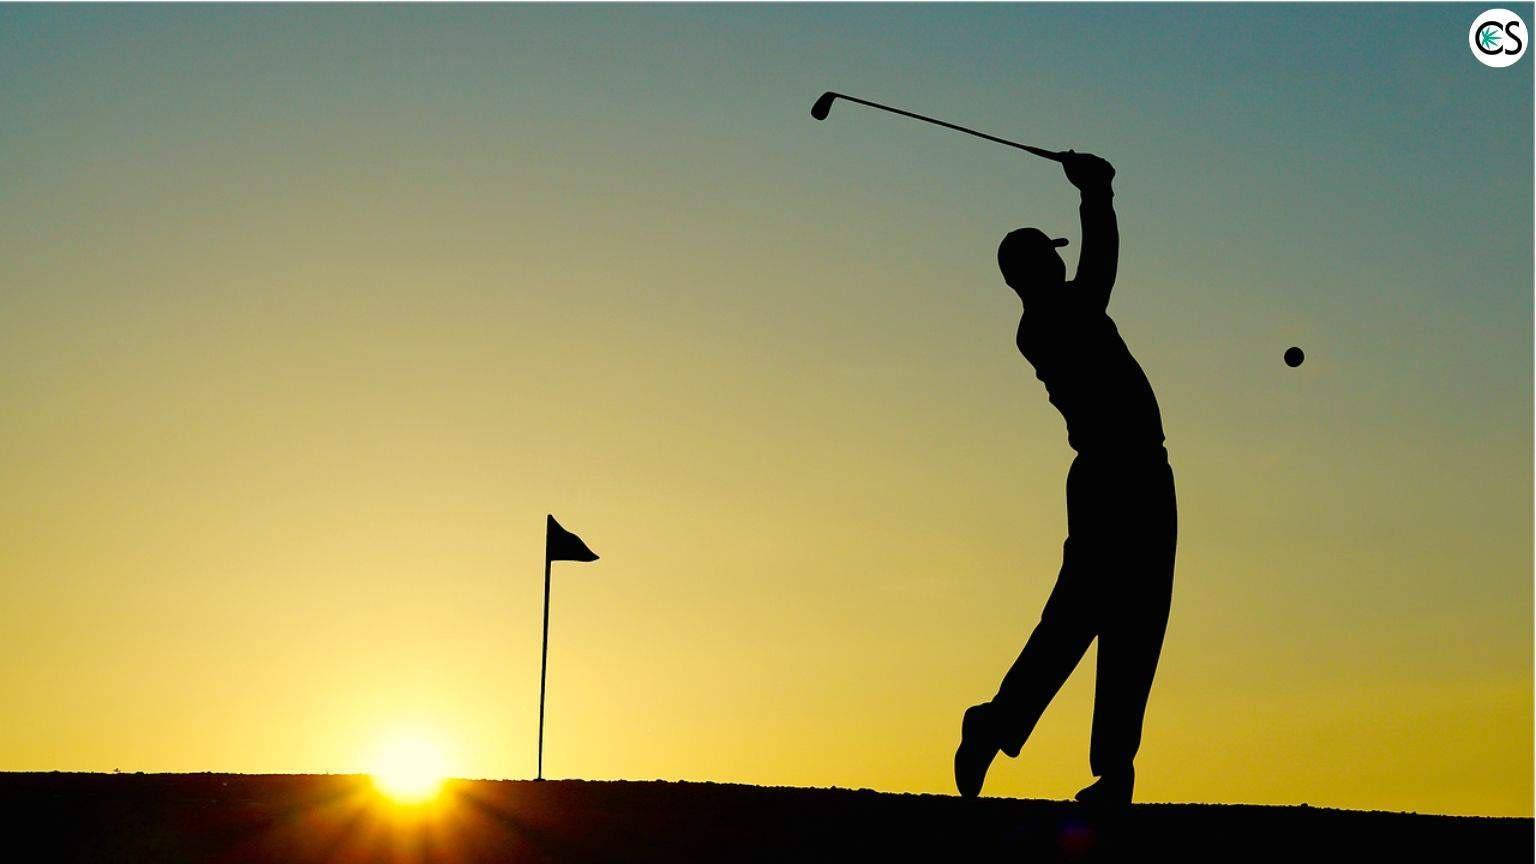 CBD gum and the golfer